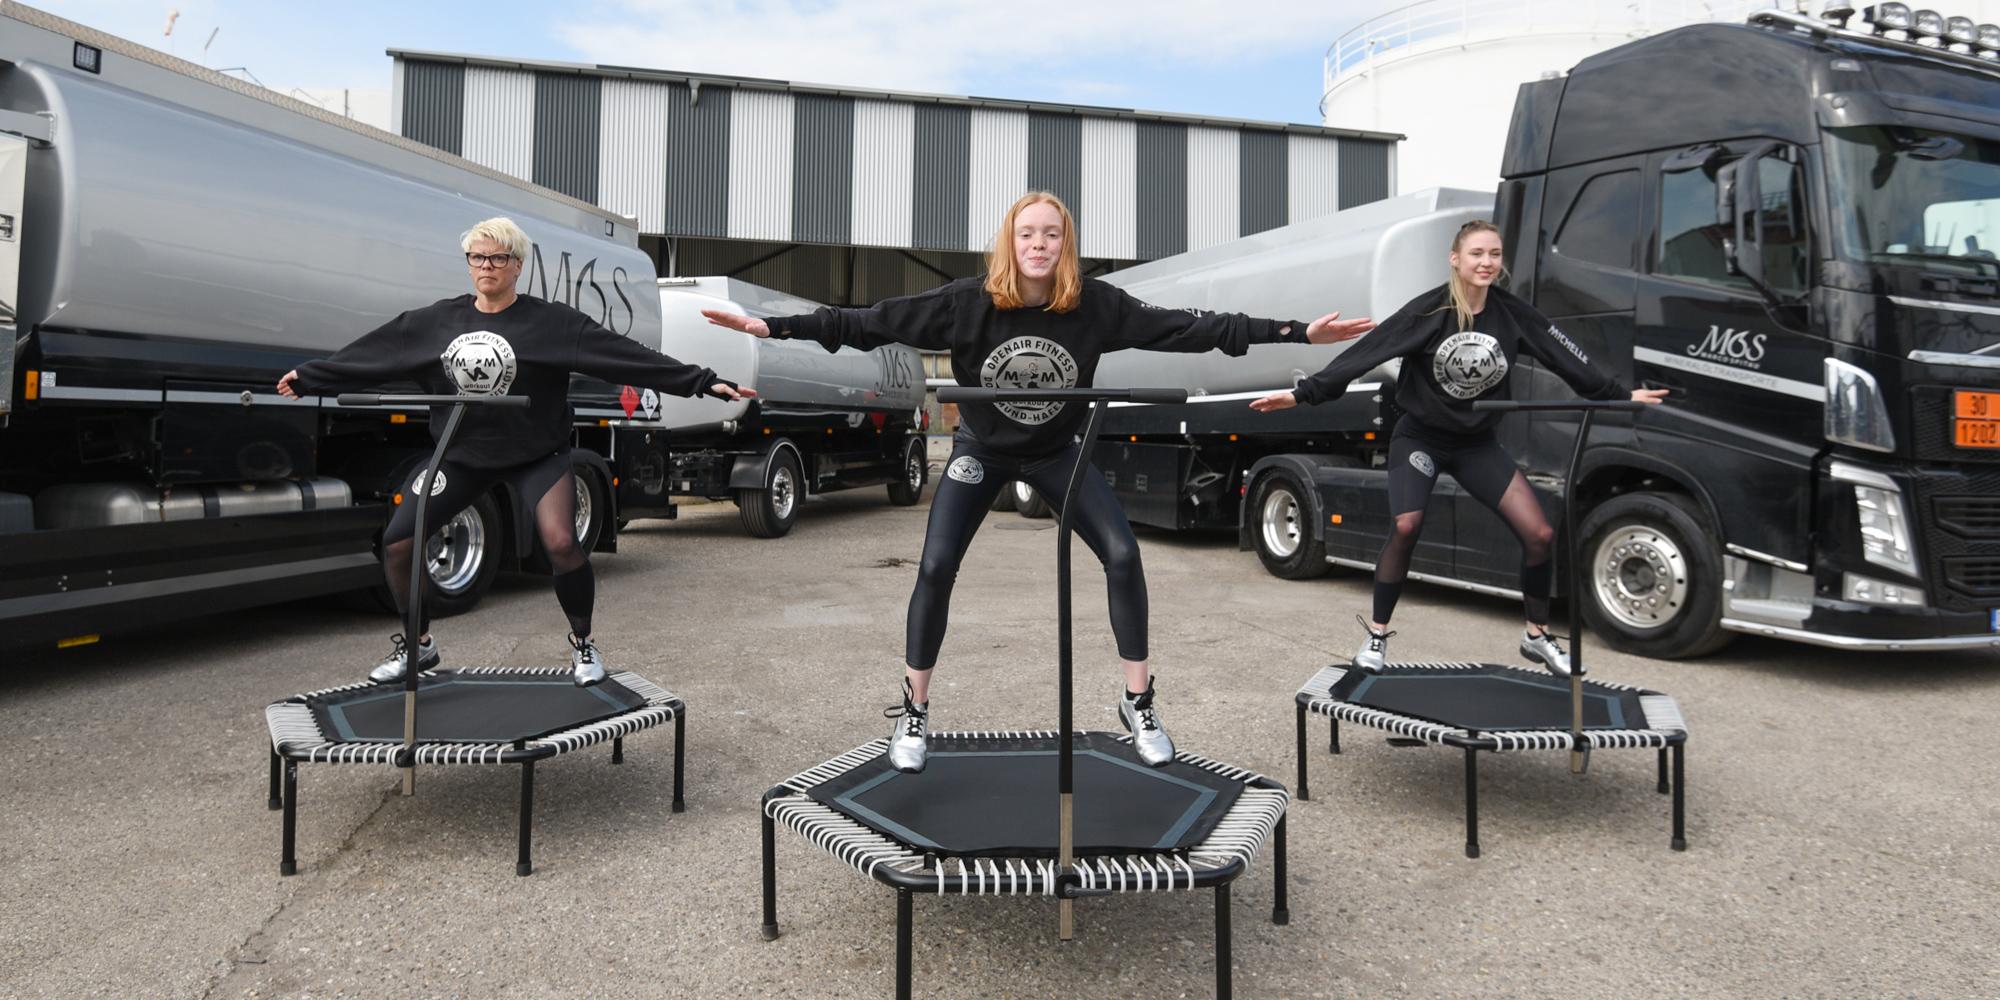 06-mm-workout-jumping-fitness-dortmund